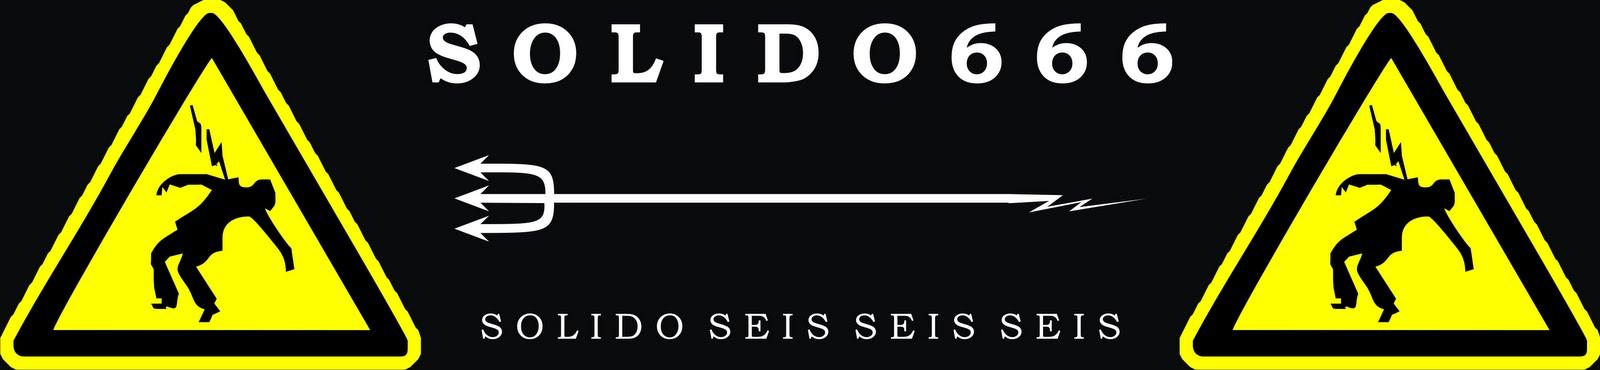 SOLIDO666